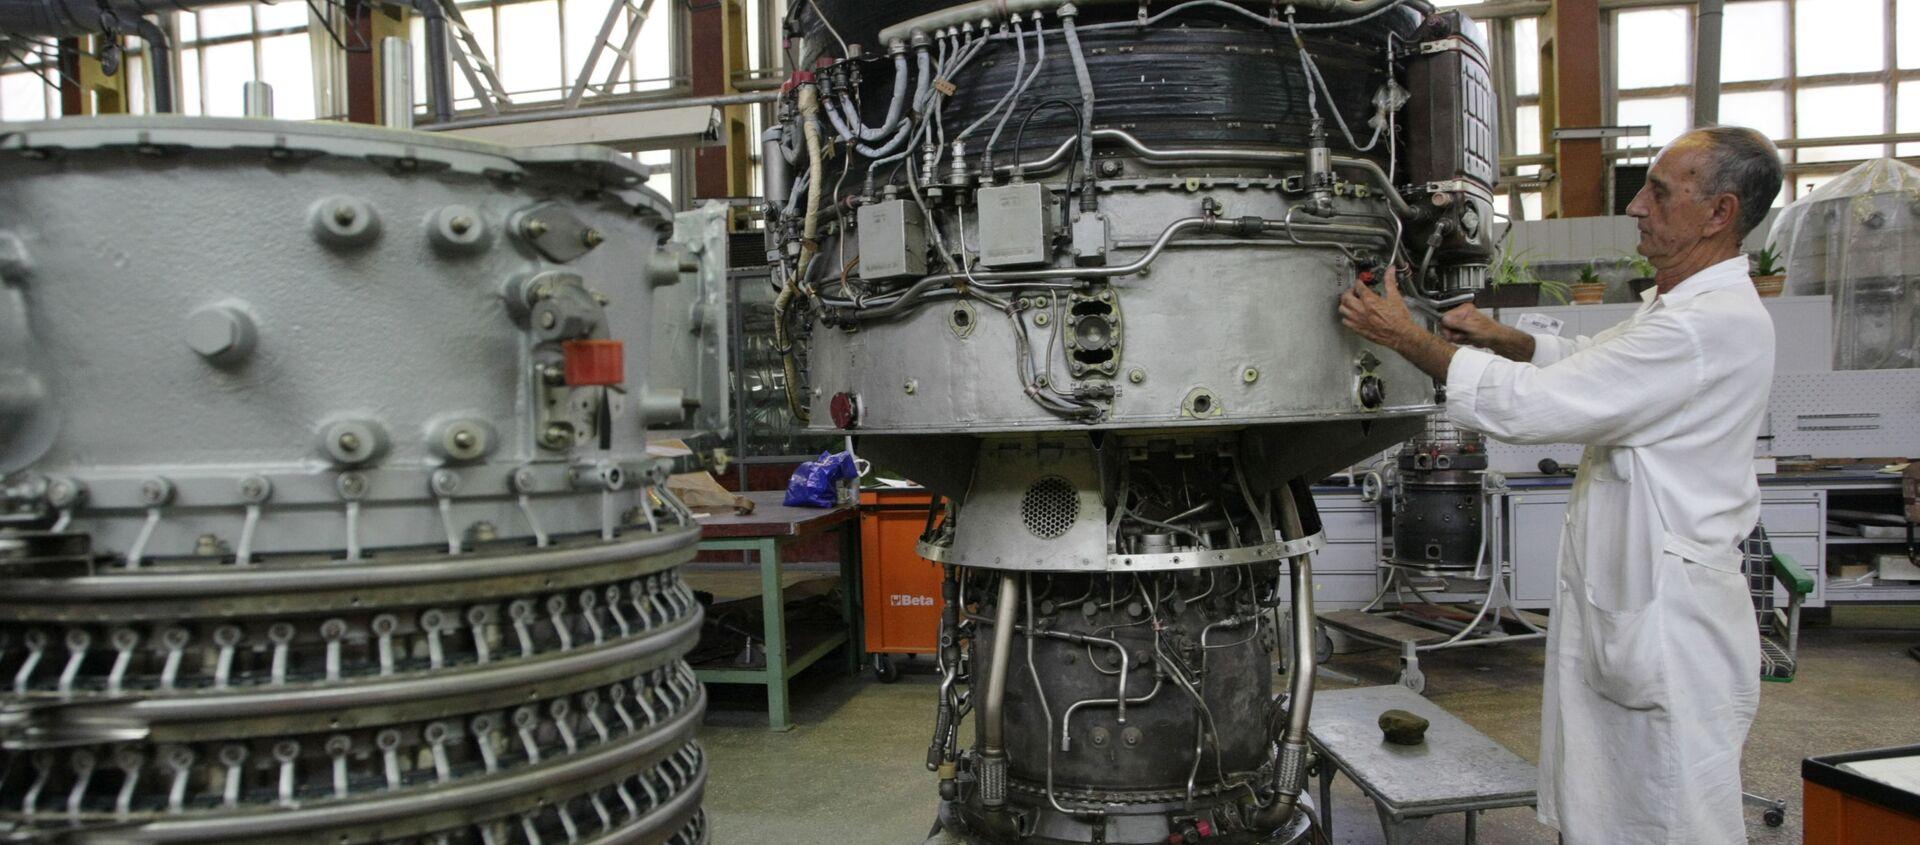 Công ty Motor Sich của Ukraina - Sputnik Việt Nam, 1920, 27.08.2019